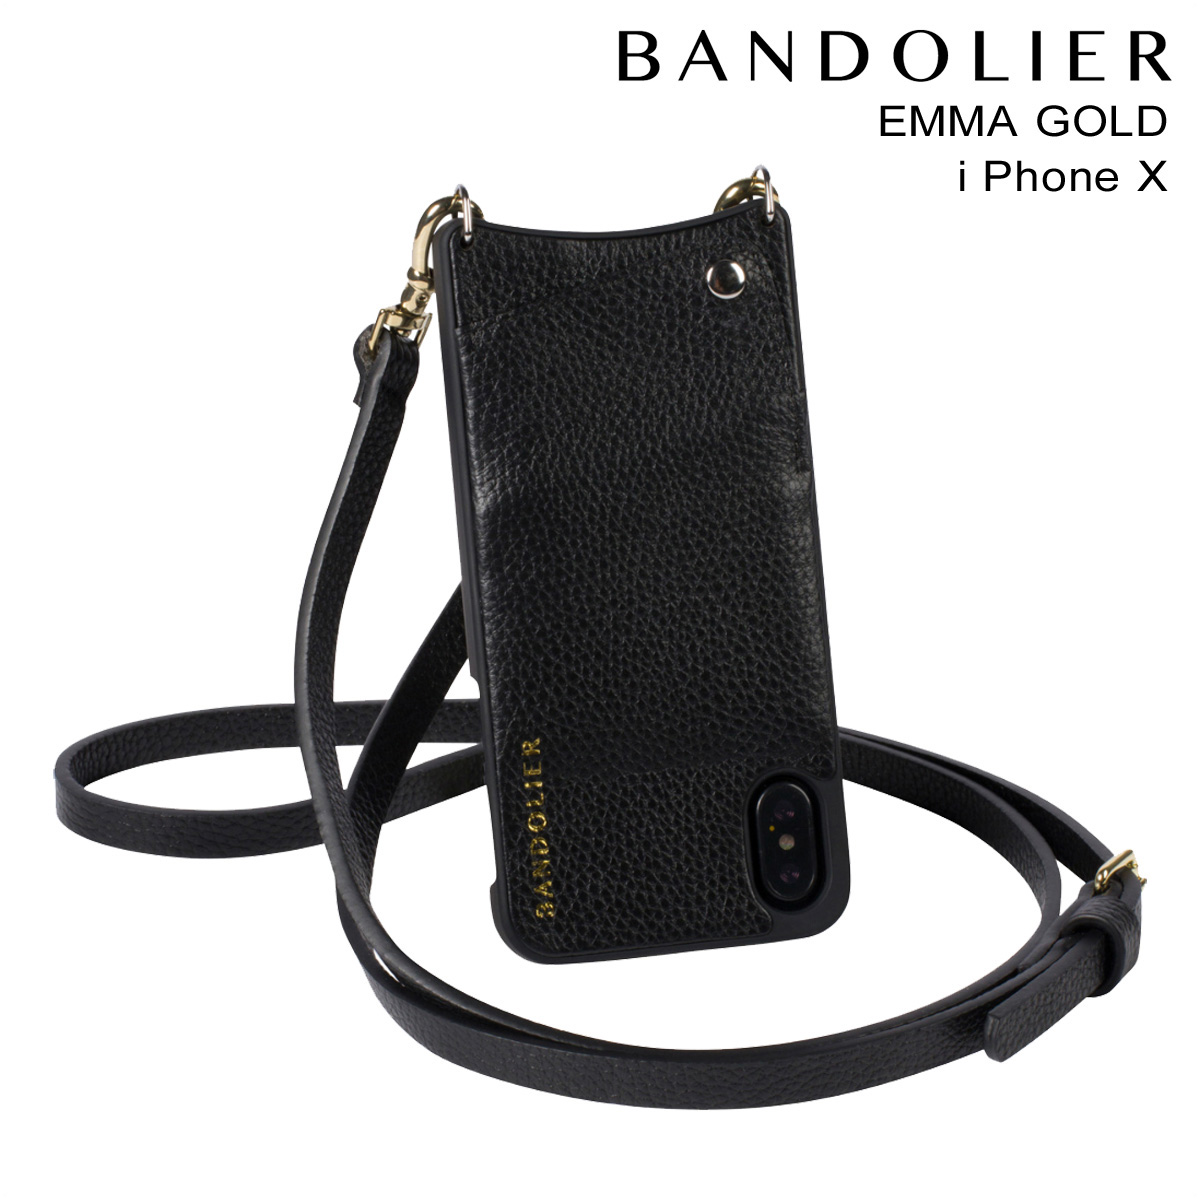 BANDOLIER バンドリヤー iPhoneX ケース スマホ アイフォン EMMA GOLD レザー メンズ レディース